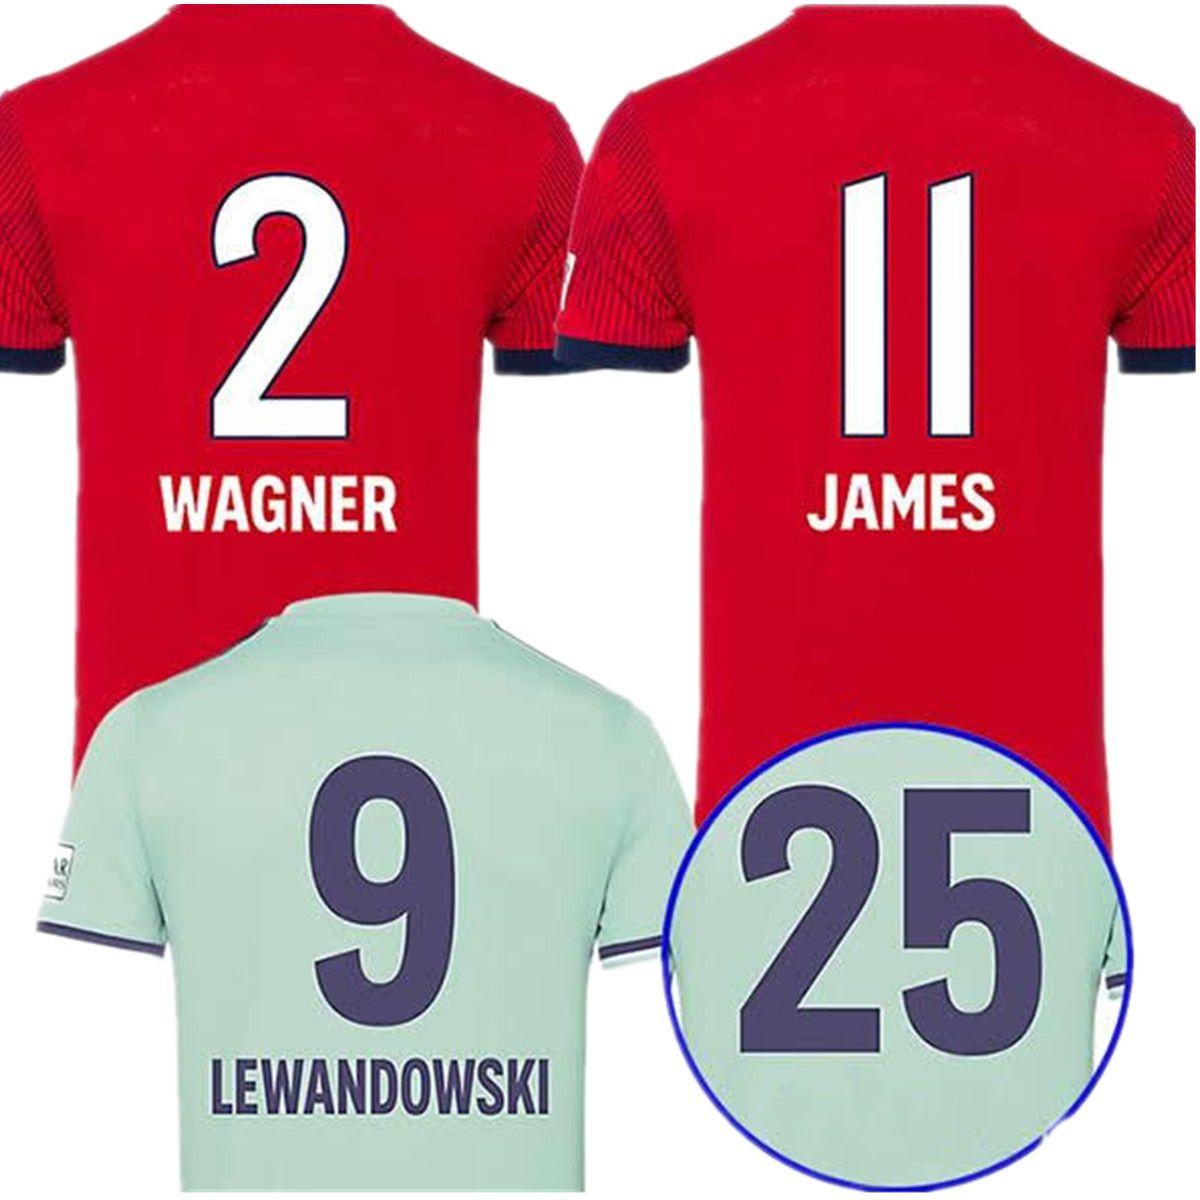 b1db3b646 WAGNER 18 19 James Home Camisetas Rojas De Fútbol LEWANDOWSKI 2018 2019  Camiseta De Fútbol TOLISSO COMAN ROBBEN MULLER KIMMICH Camiseta Maillot Por  ...